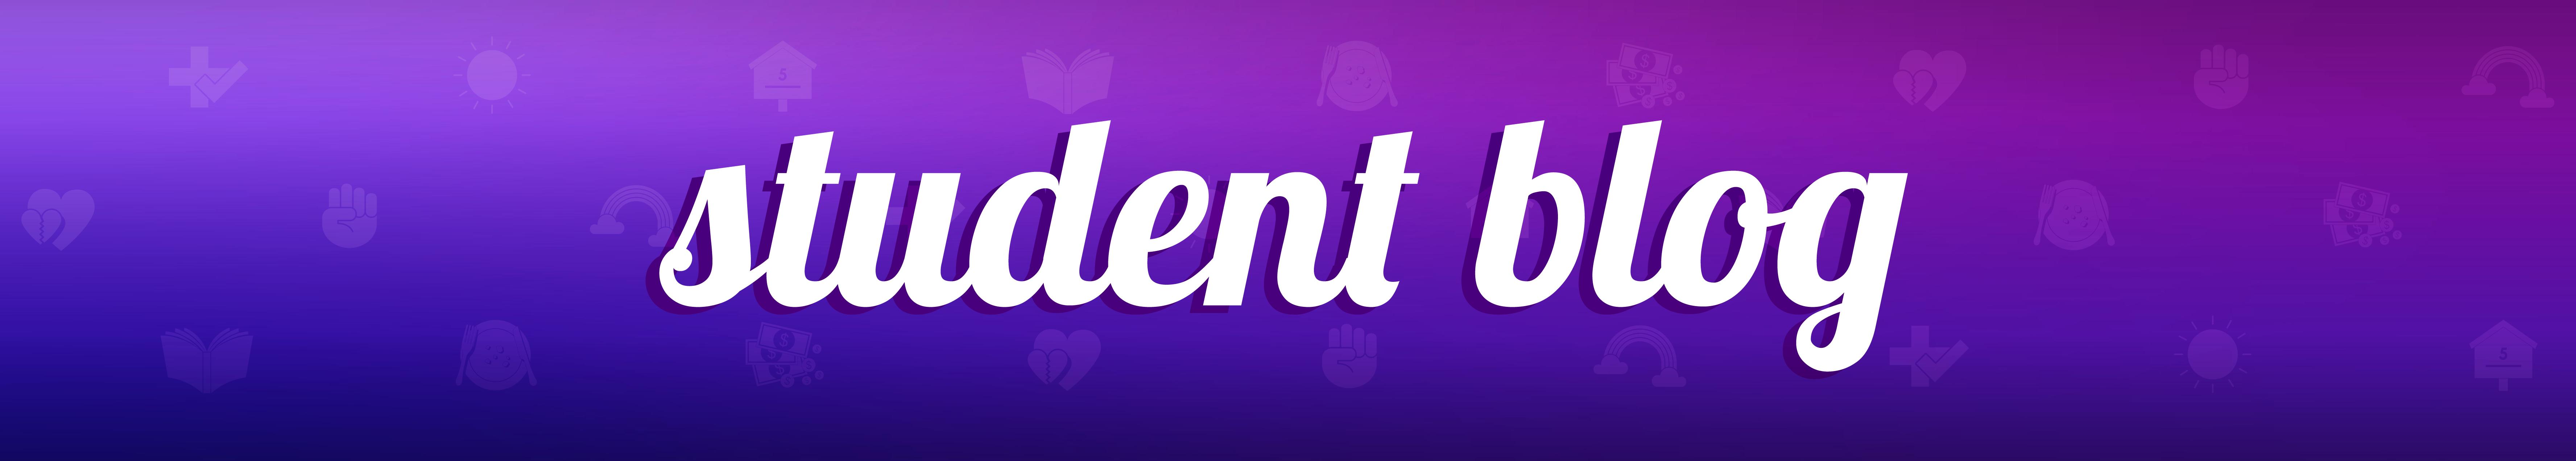 student blog banner